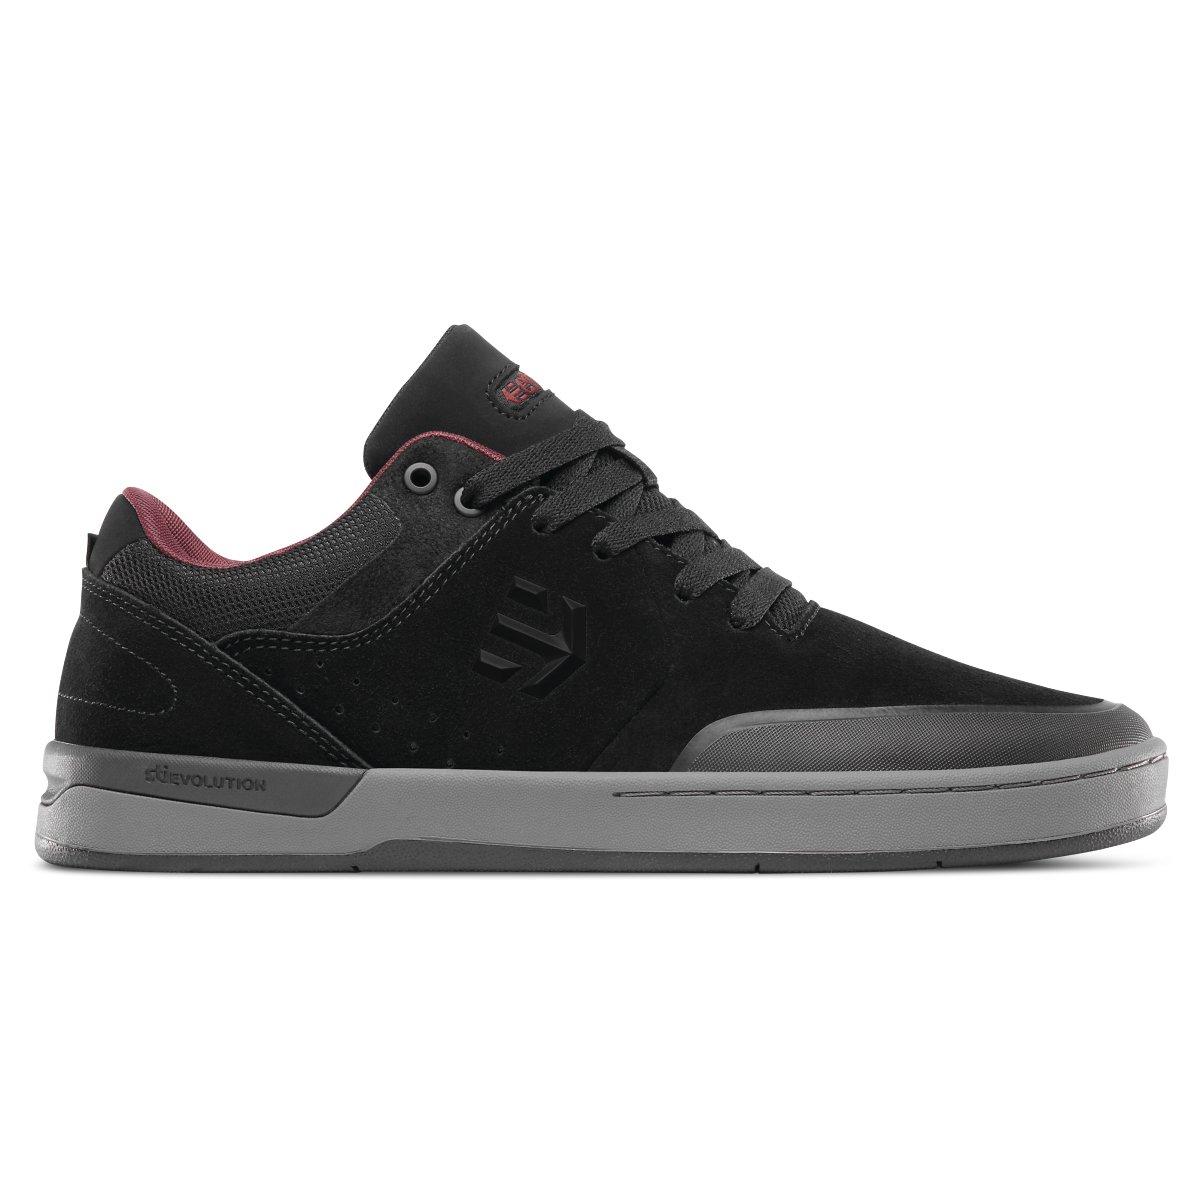 Etnies Men's Marana Xt Skateboarding Shoe 9.5 D(M) US|Black/Grey/Red